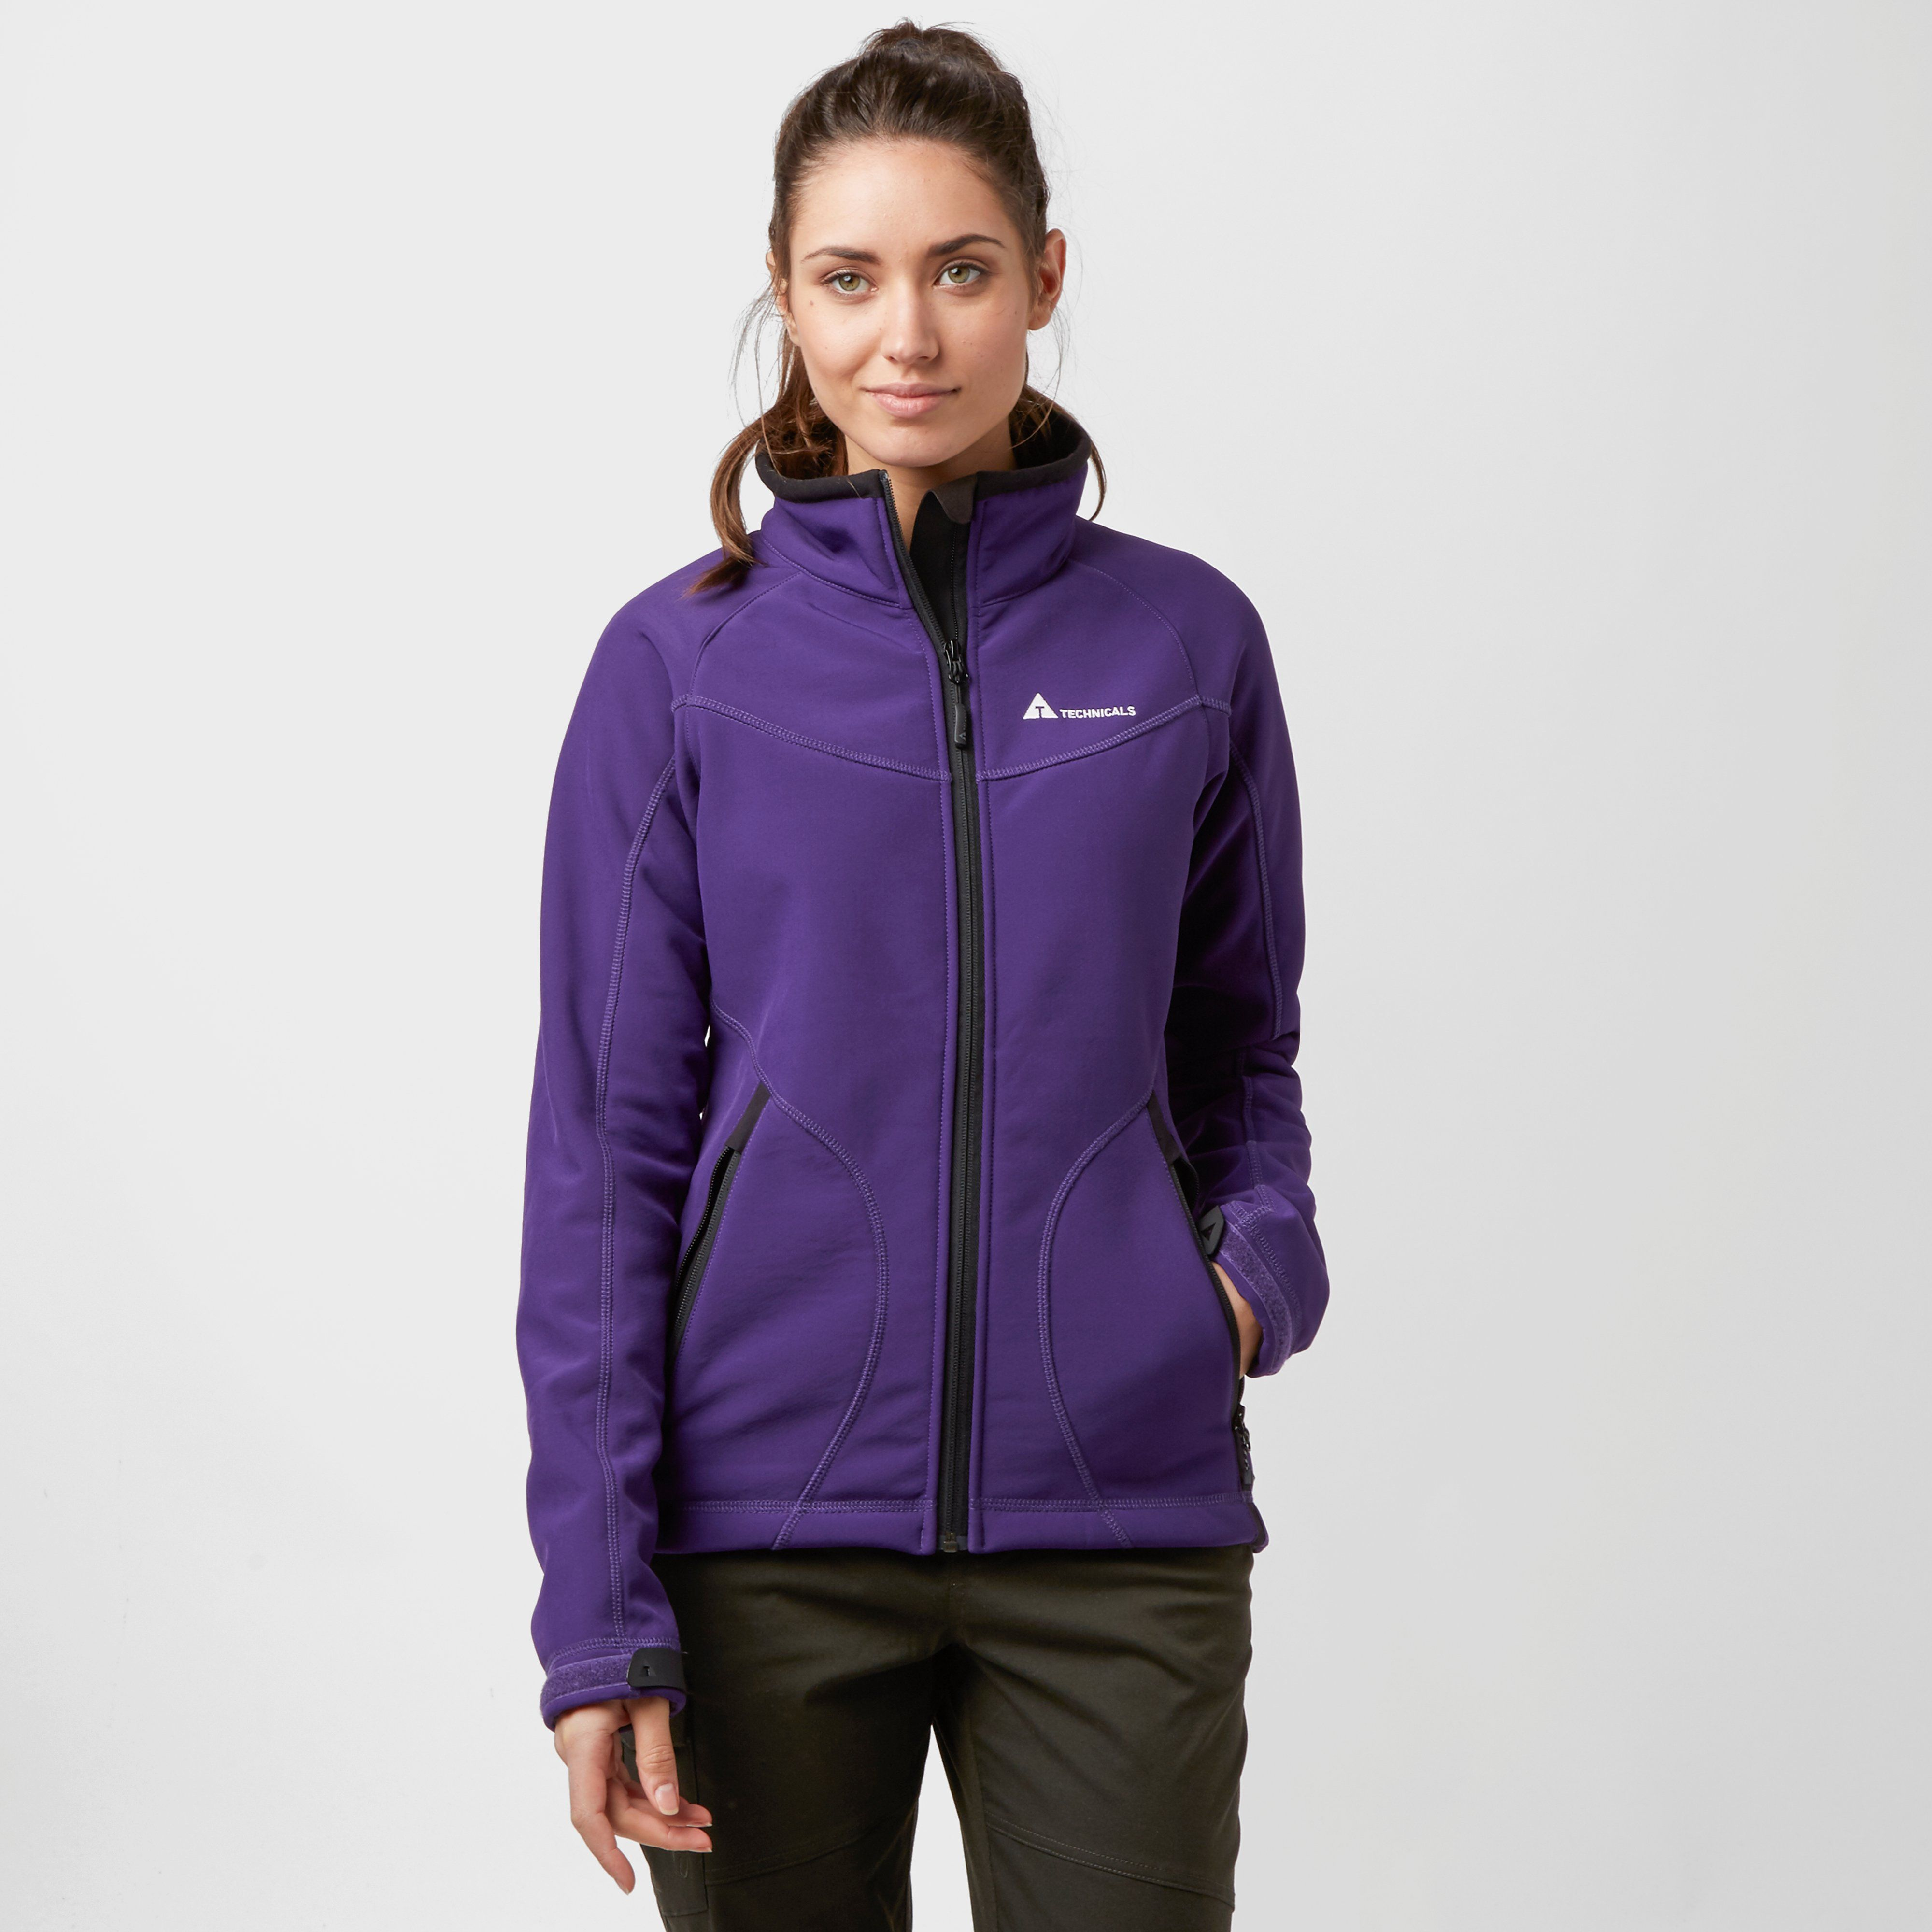 TECHNICALS Women's Proton Softshell Jacket